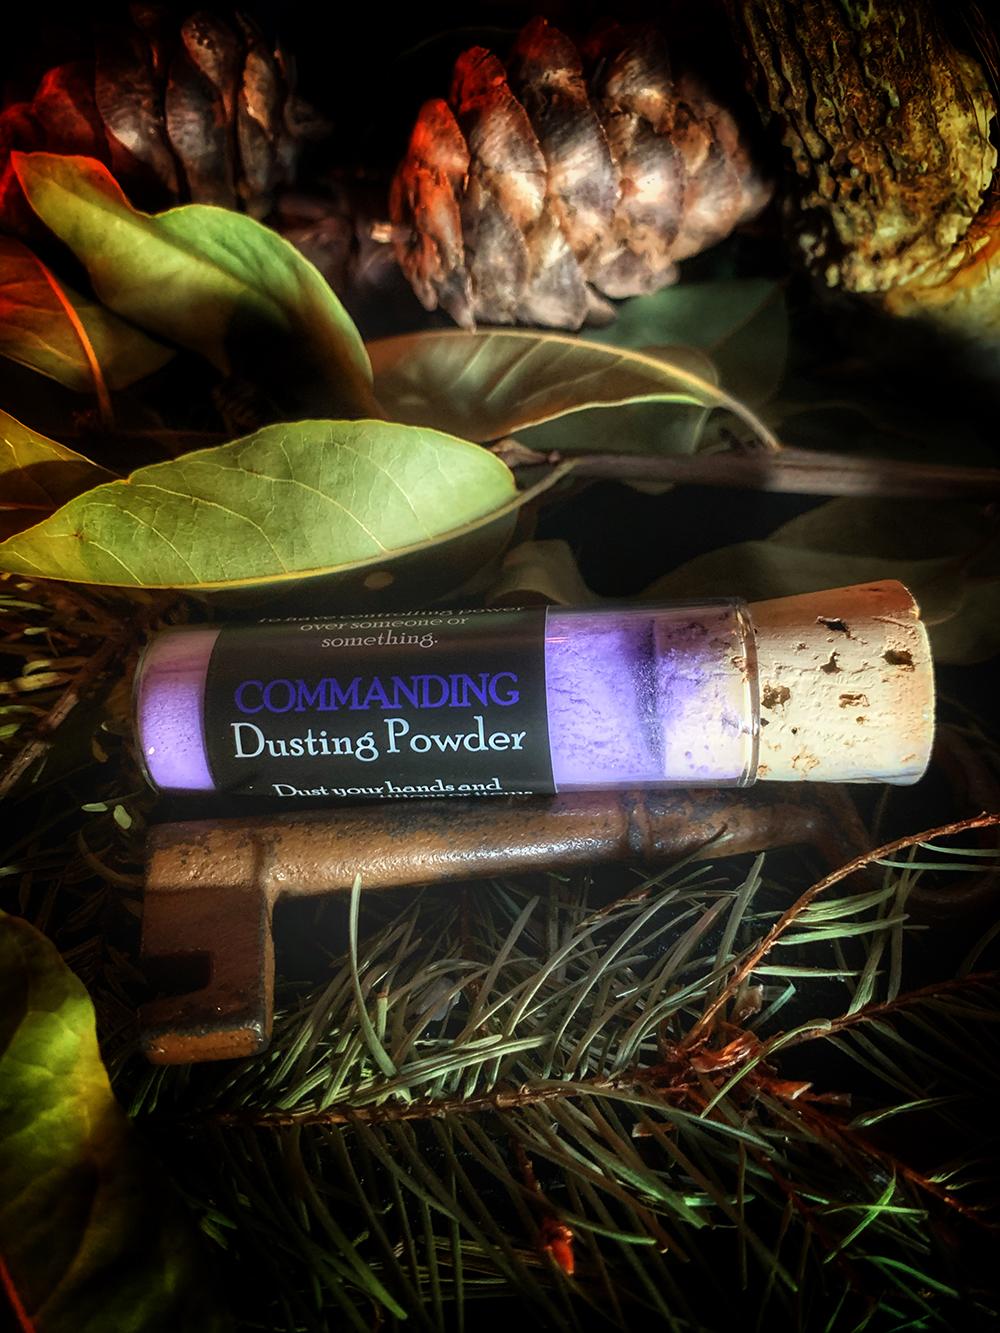 Commanding Dusting Powder